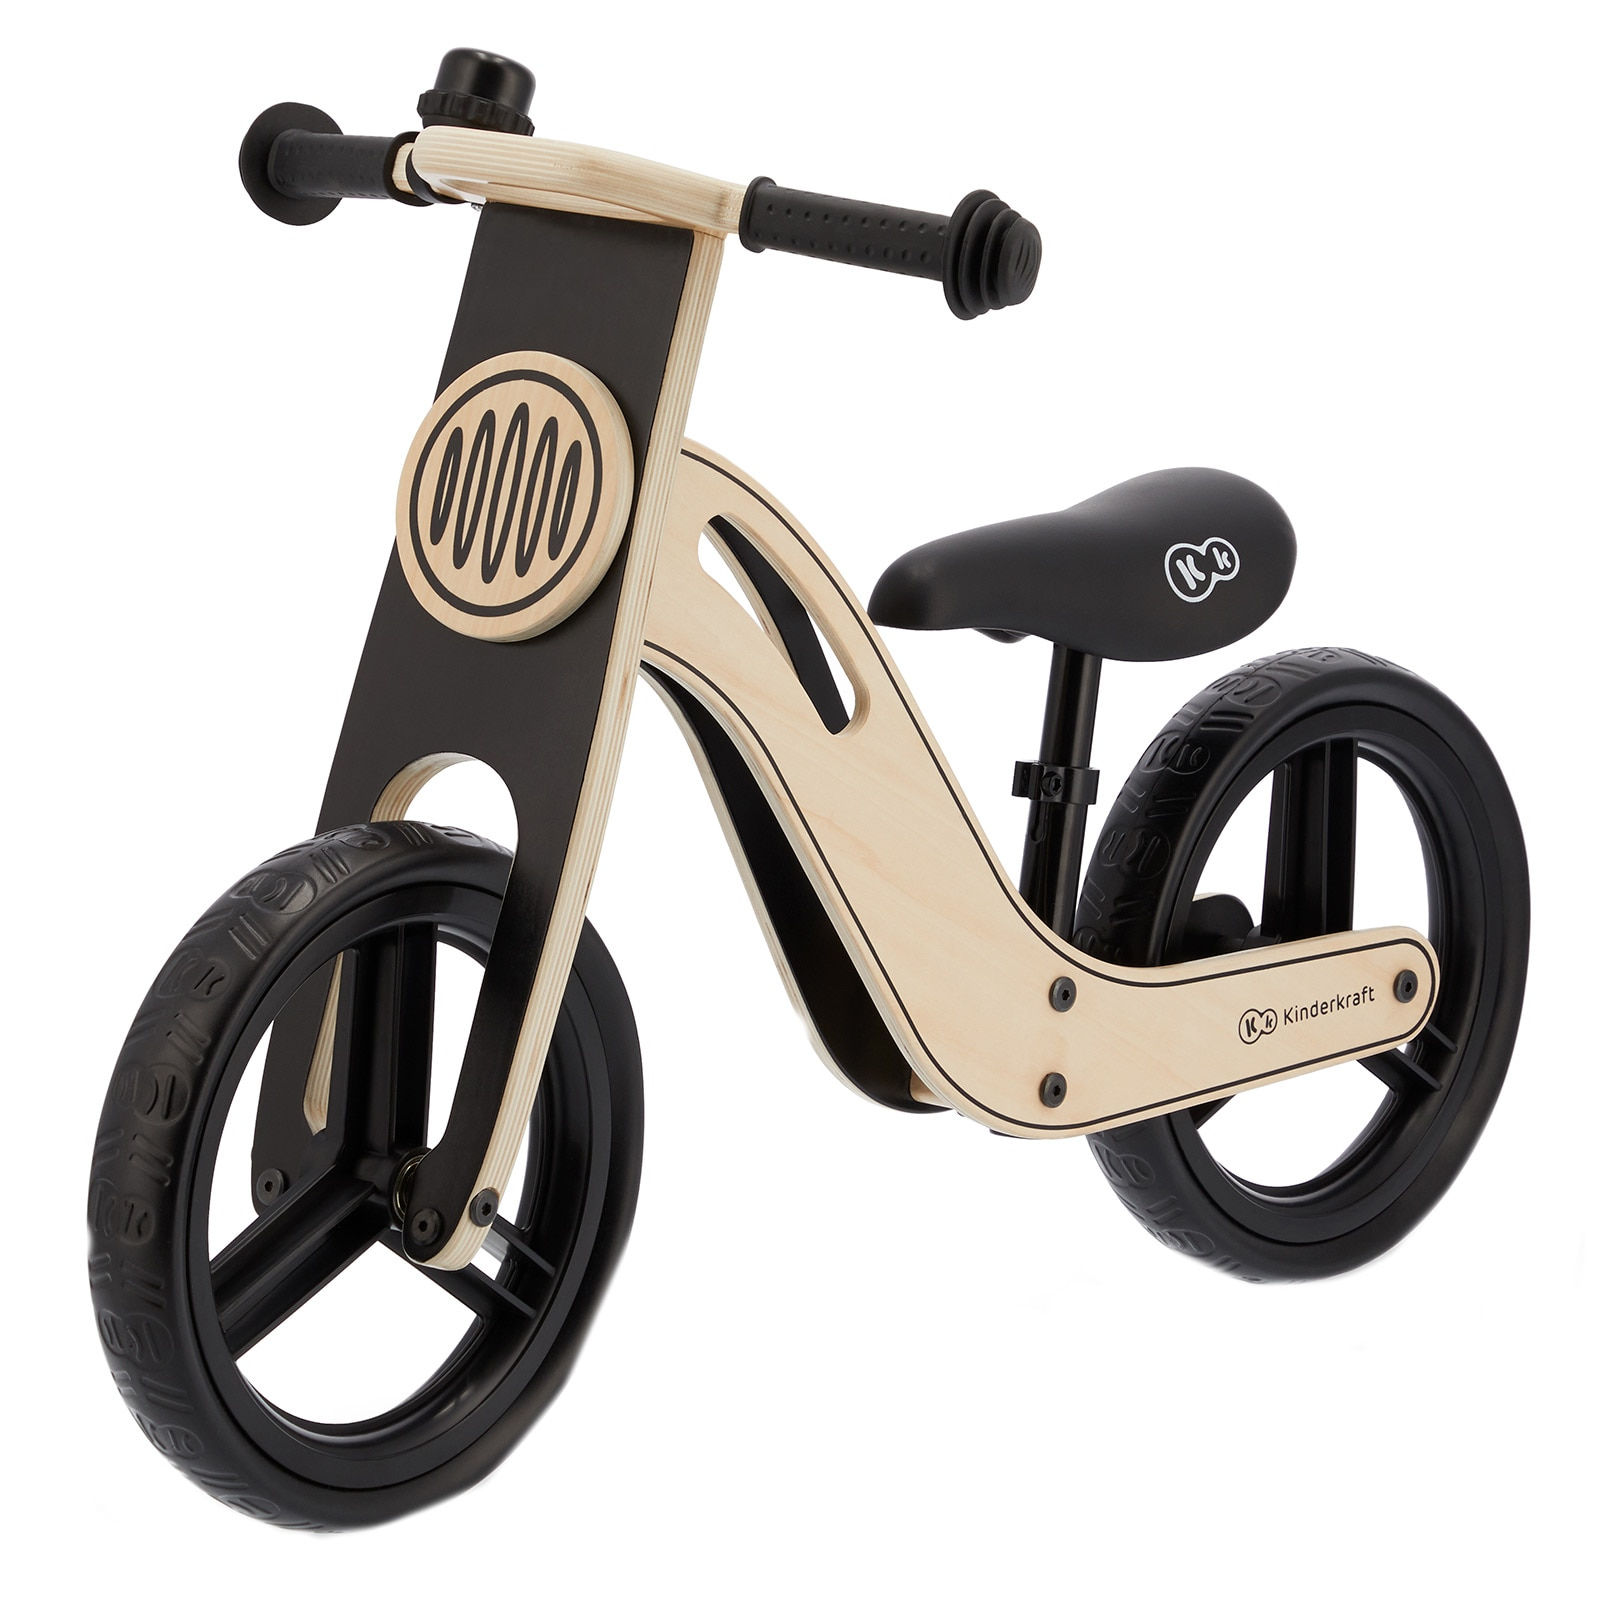 Fotografie Bicicleta din lemn fara pedale Kinderkraft - Uniq nature